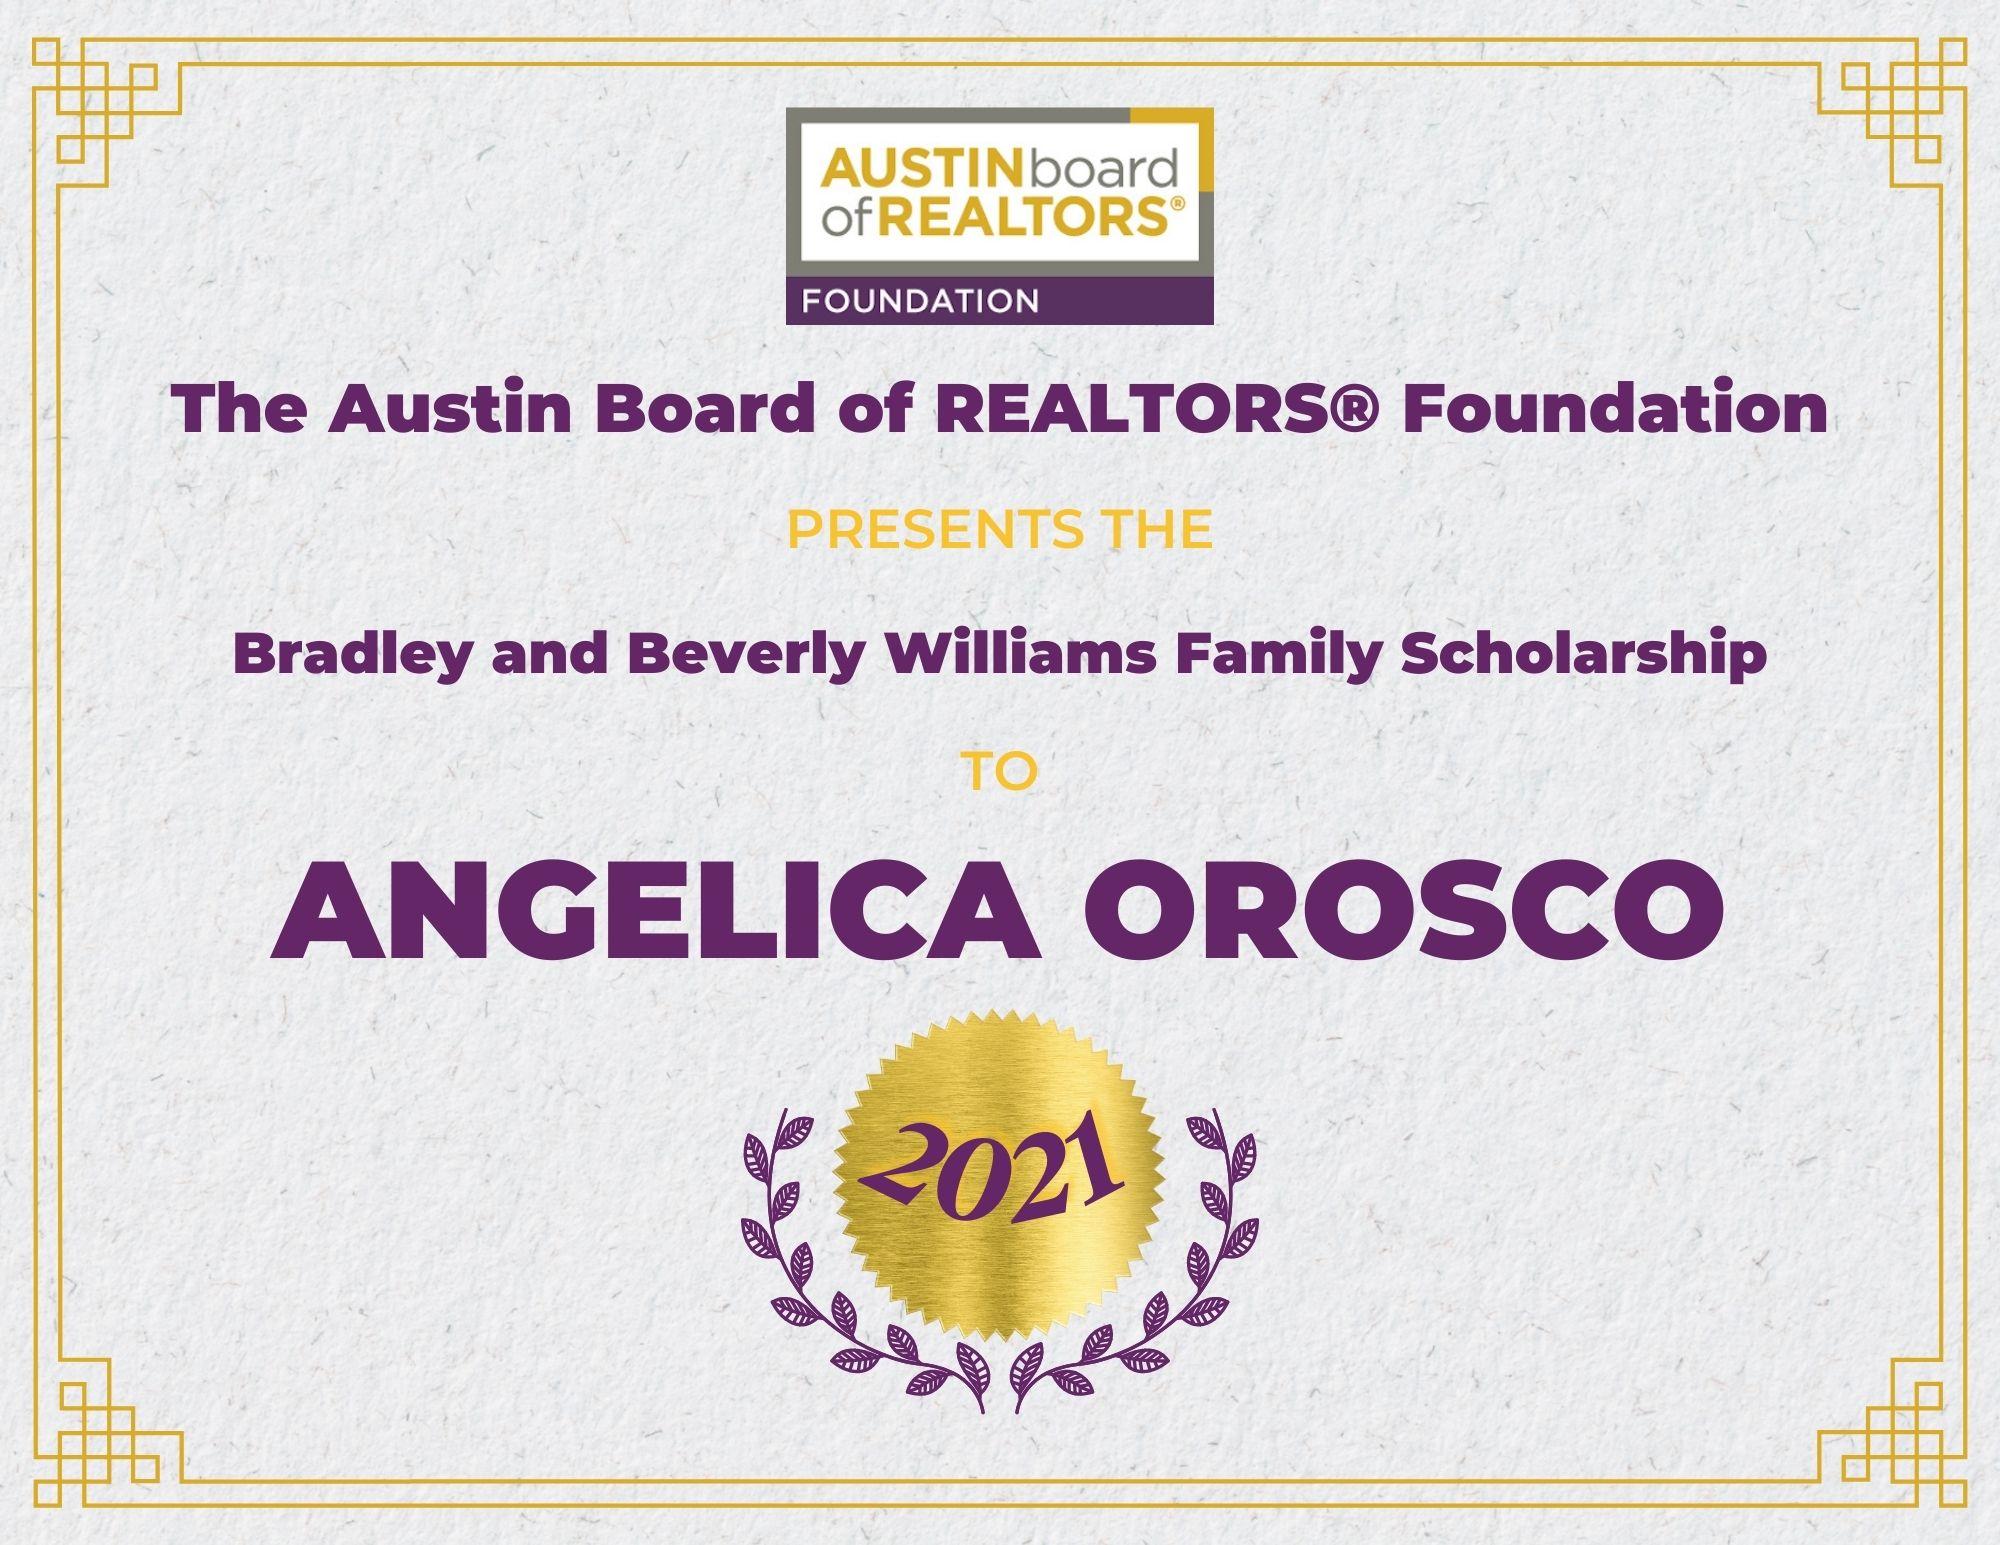 2021 Fou Scholarship Certificate Angelicaorosco